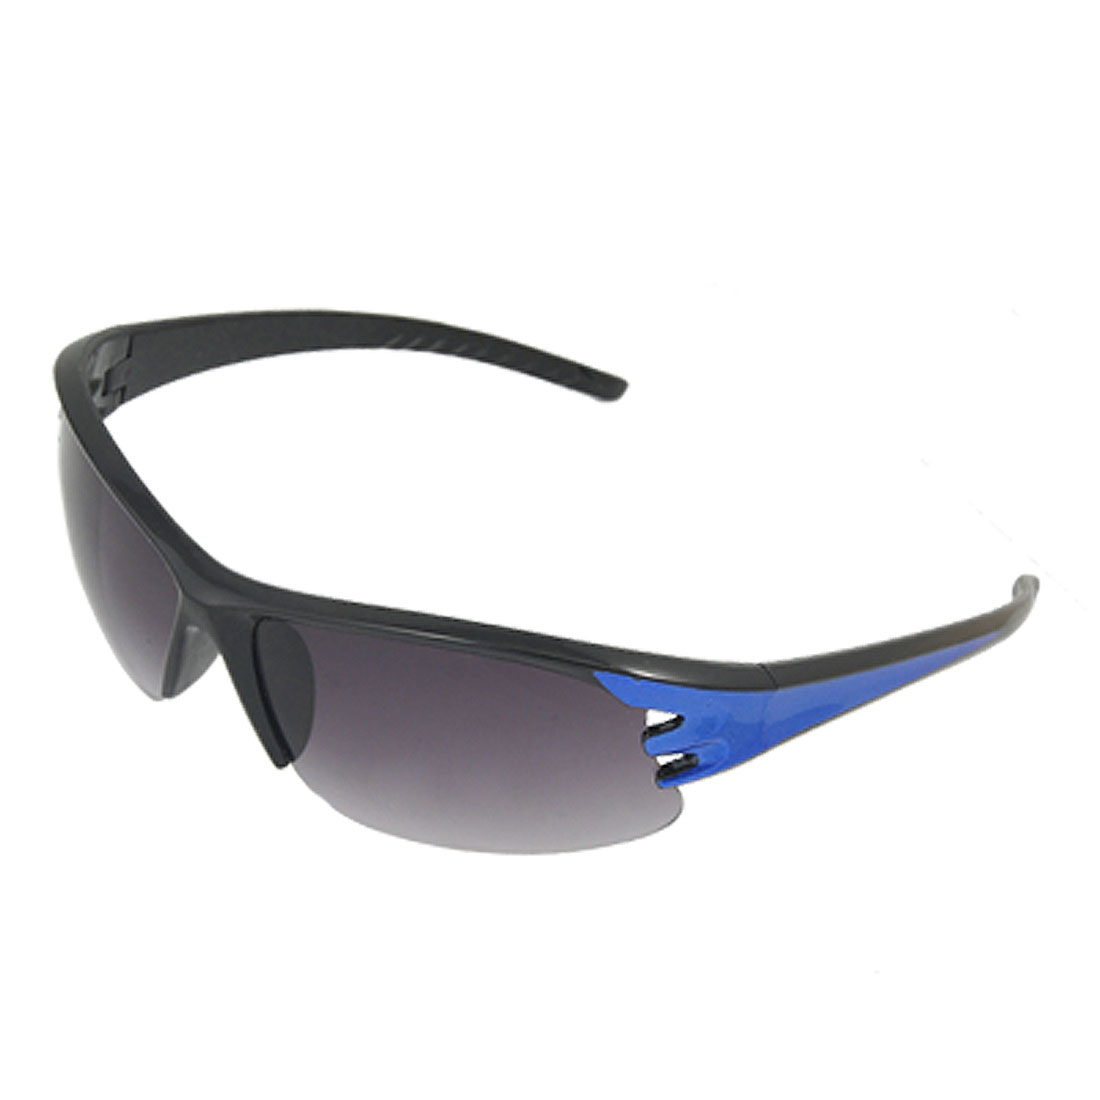 Unisex Blue Detail Arm Semi Rim Sunglasses Eyewear for Sports